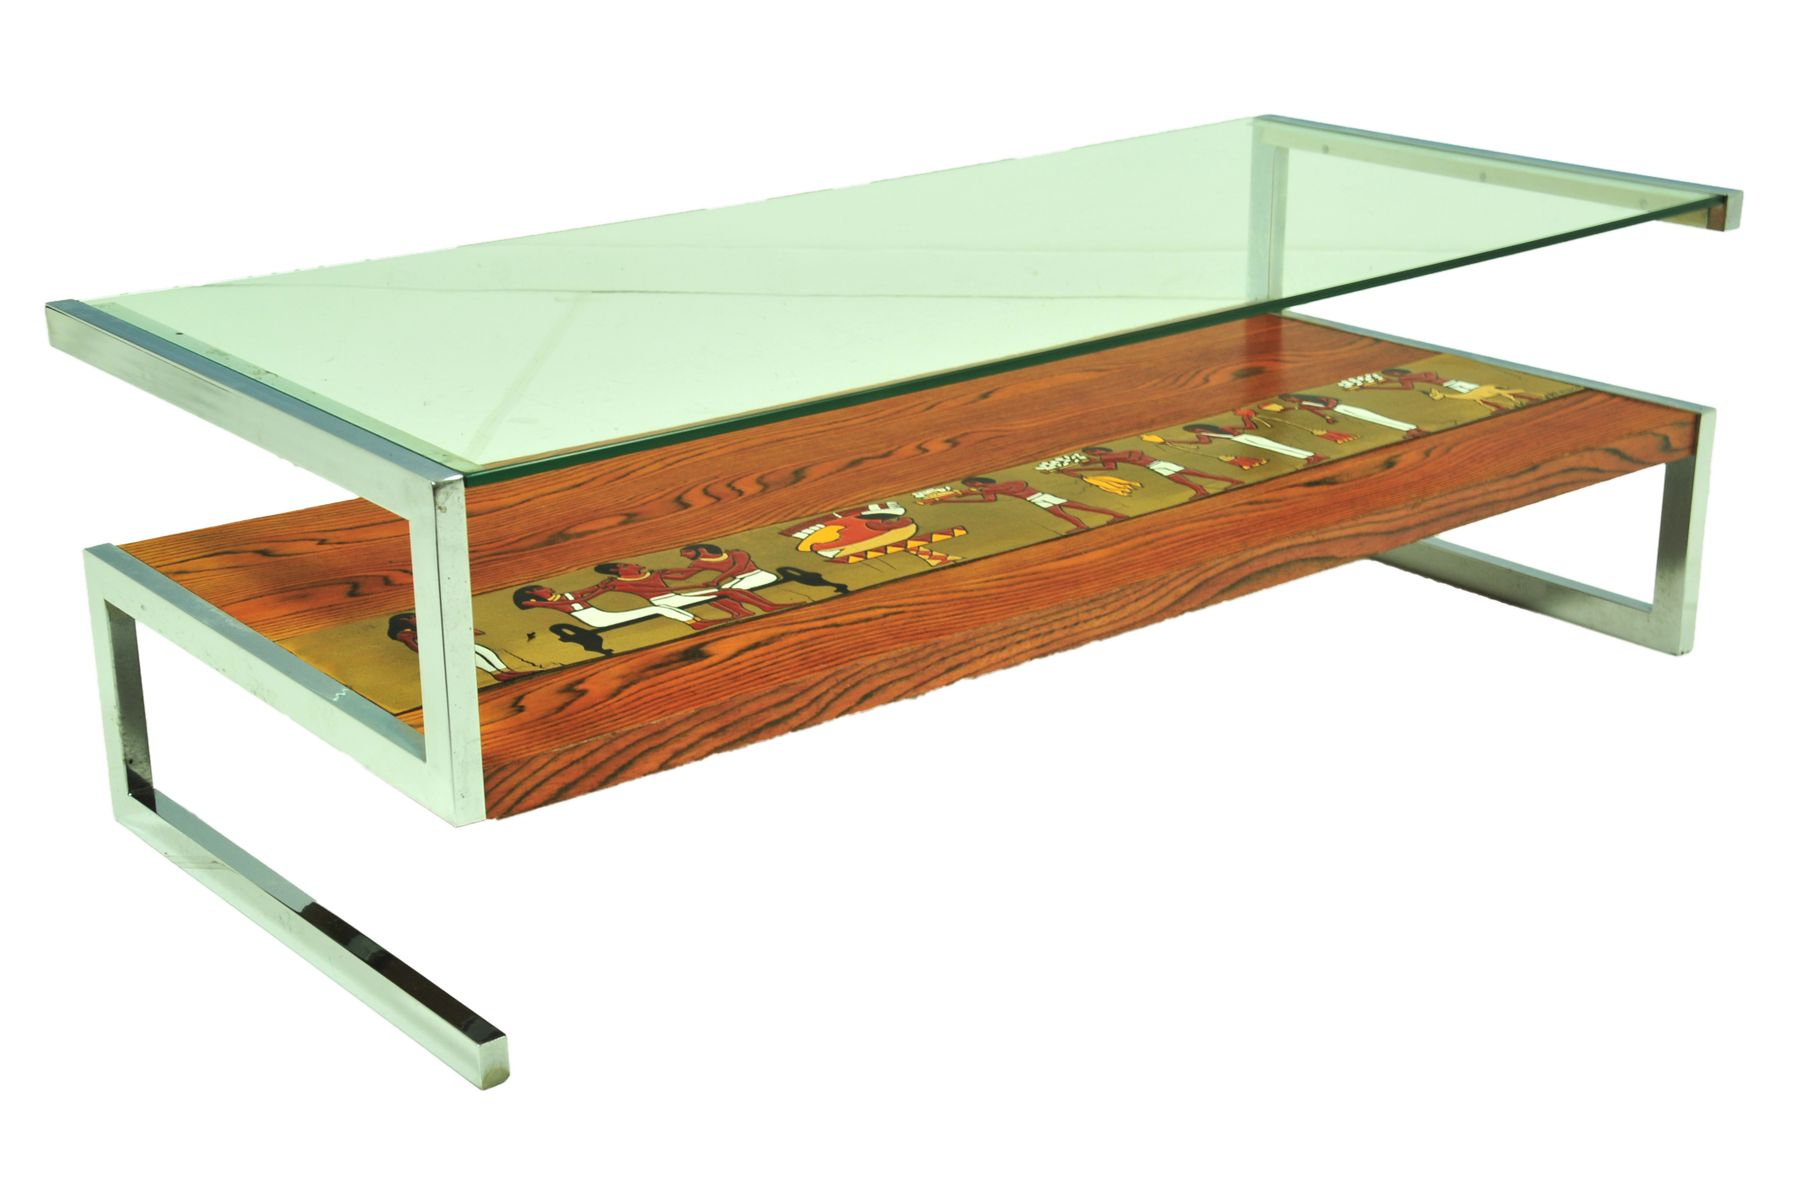 Italian Coffee Table Mid Century Italian Coffee Table From Denisco For Sale At Pamono